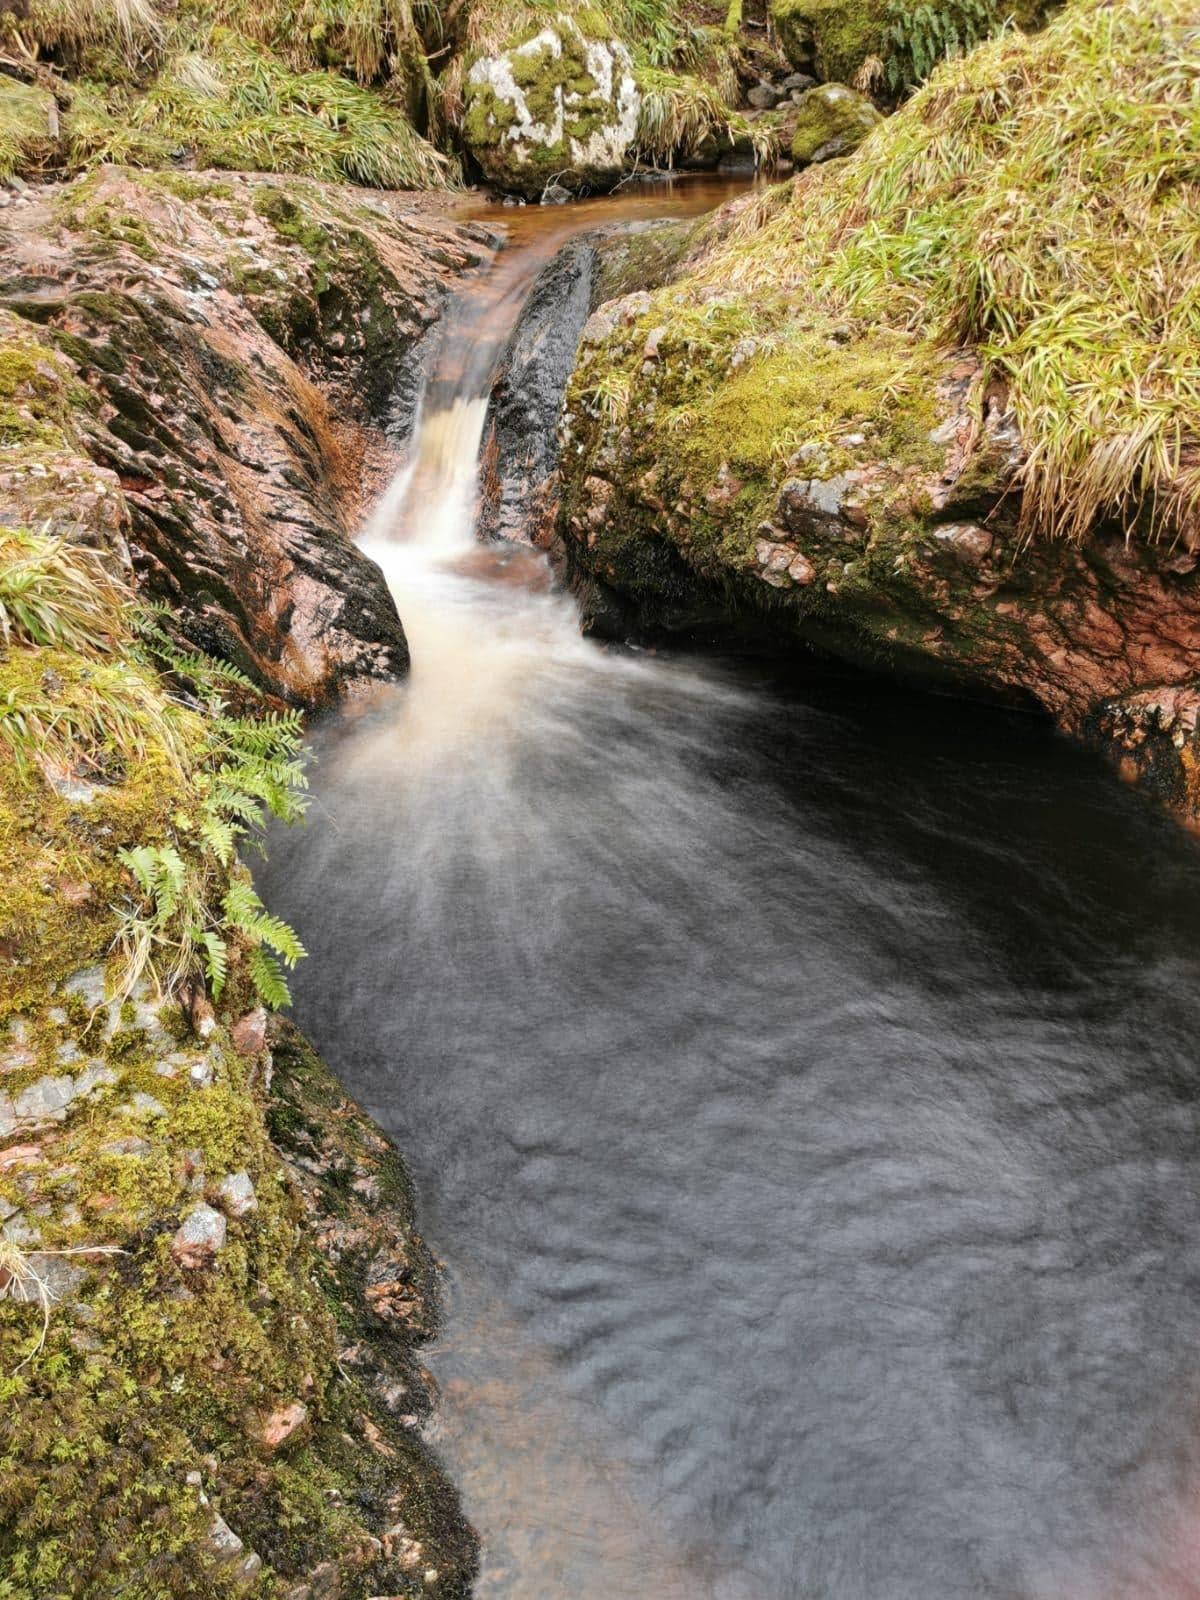 Clava Cairns Waterfall Pool